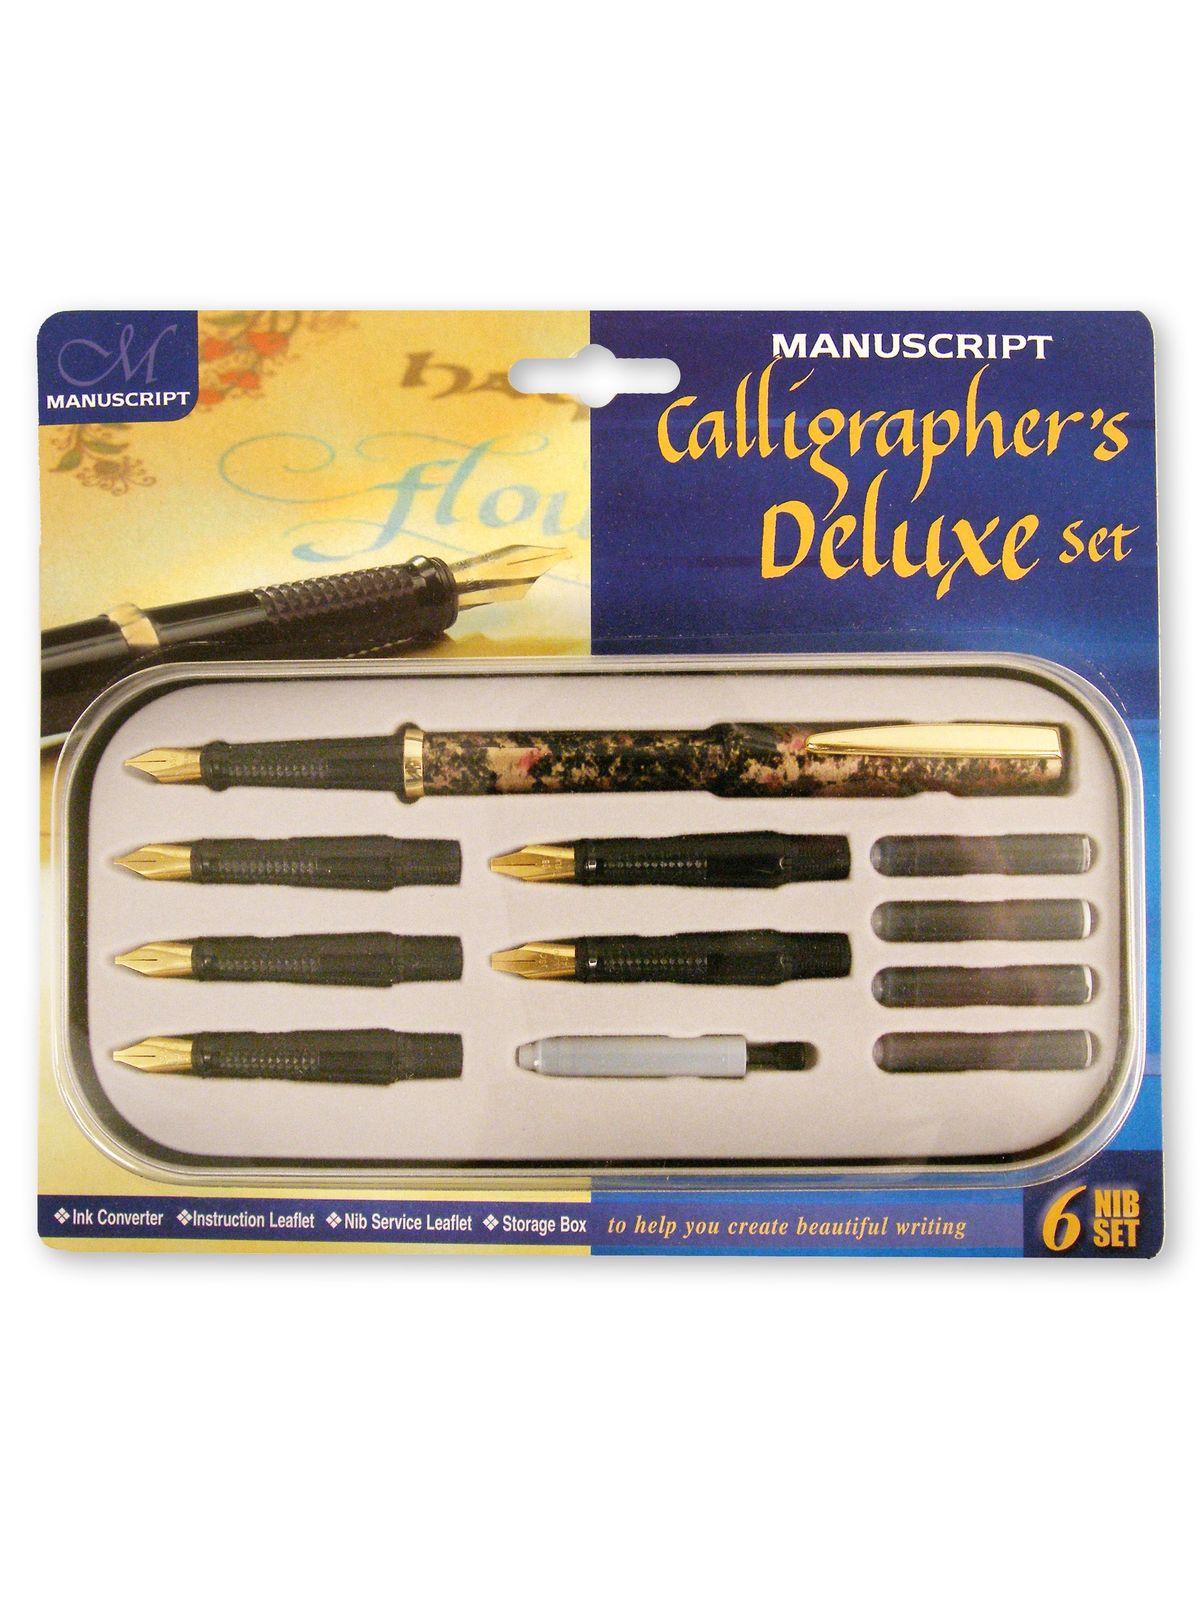 Manuscript - Calligrapher's Deluxe Set